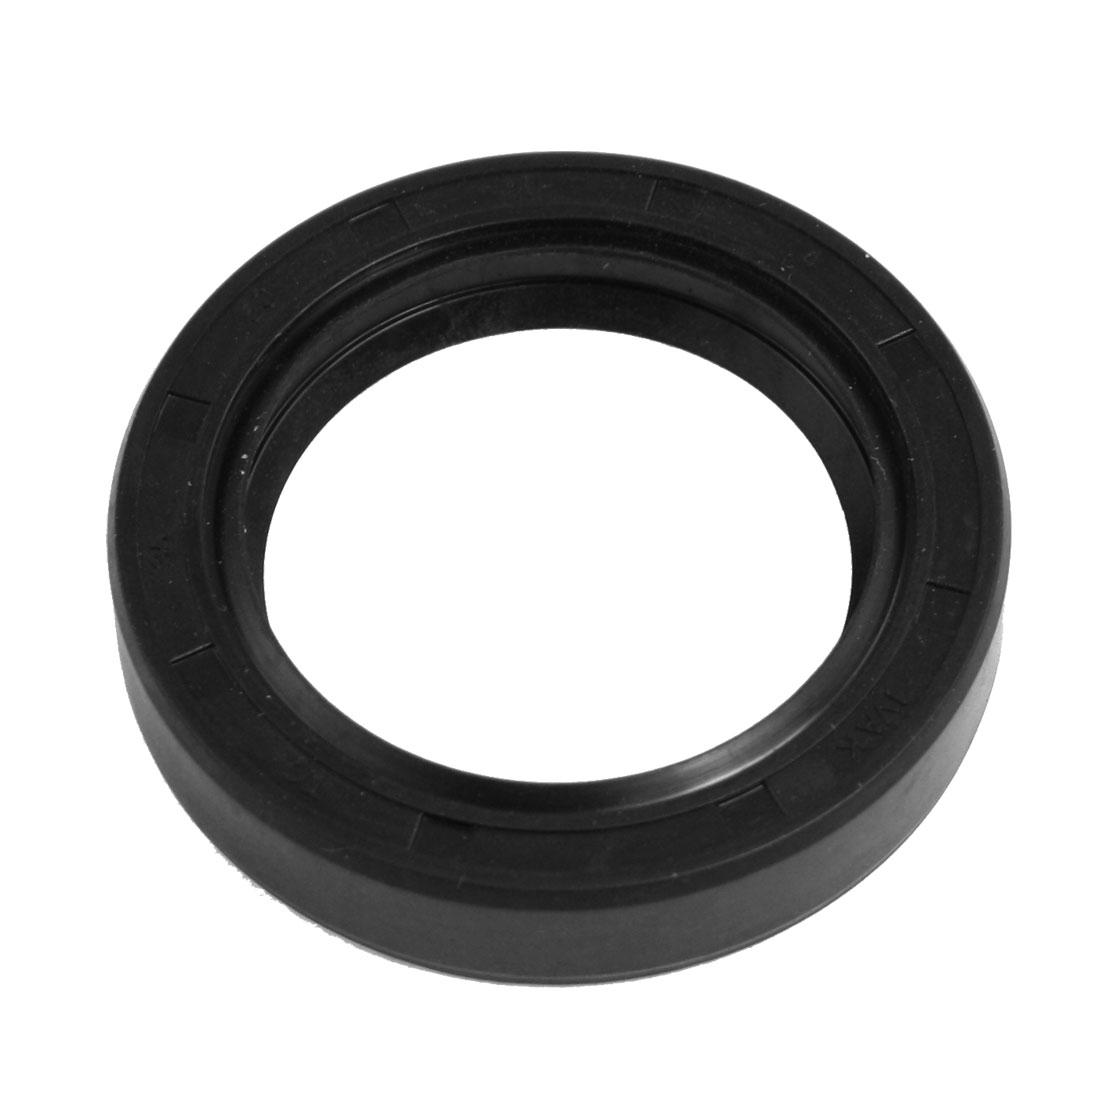 Metric TC Nitrile Rubber Double Lip Oil Shaft Seal 35mm x 50mm x 10mm